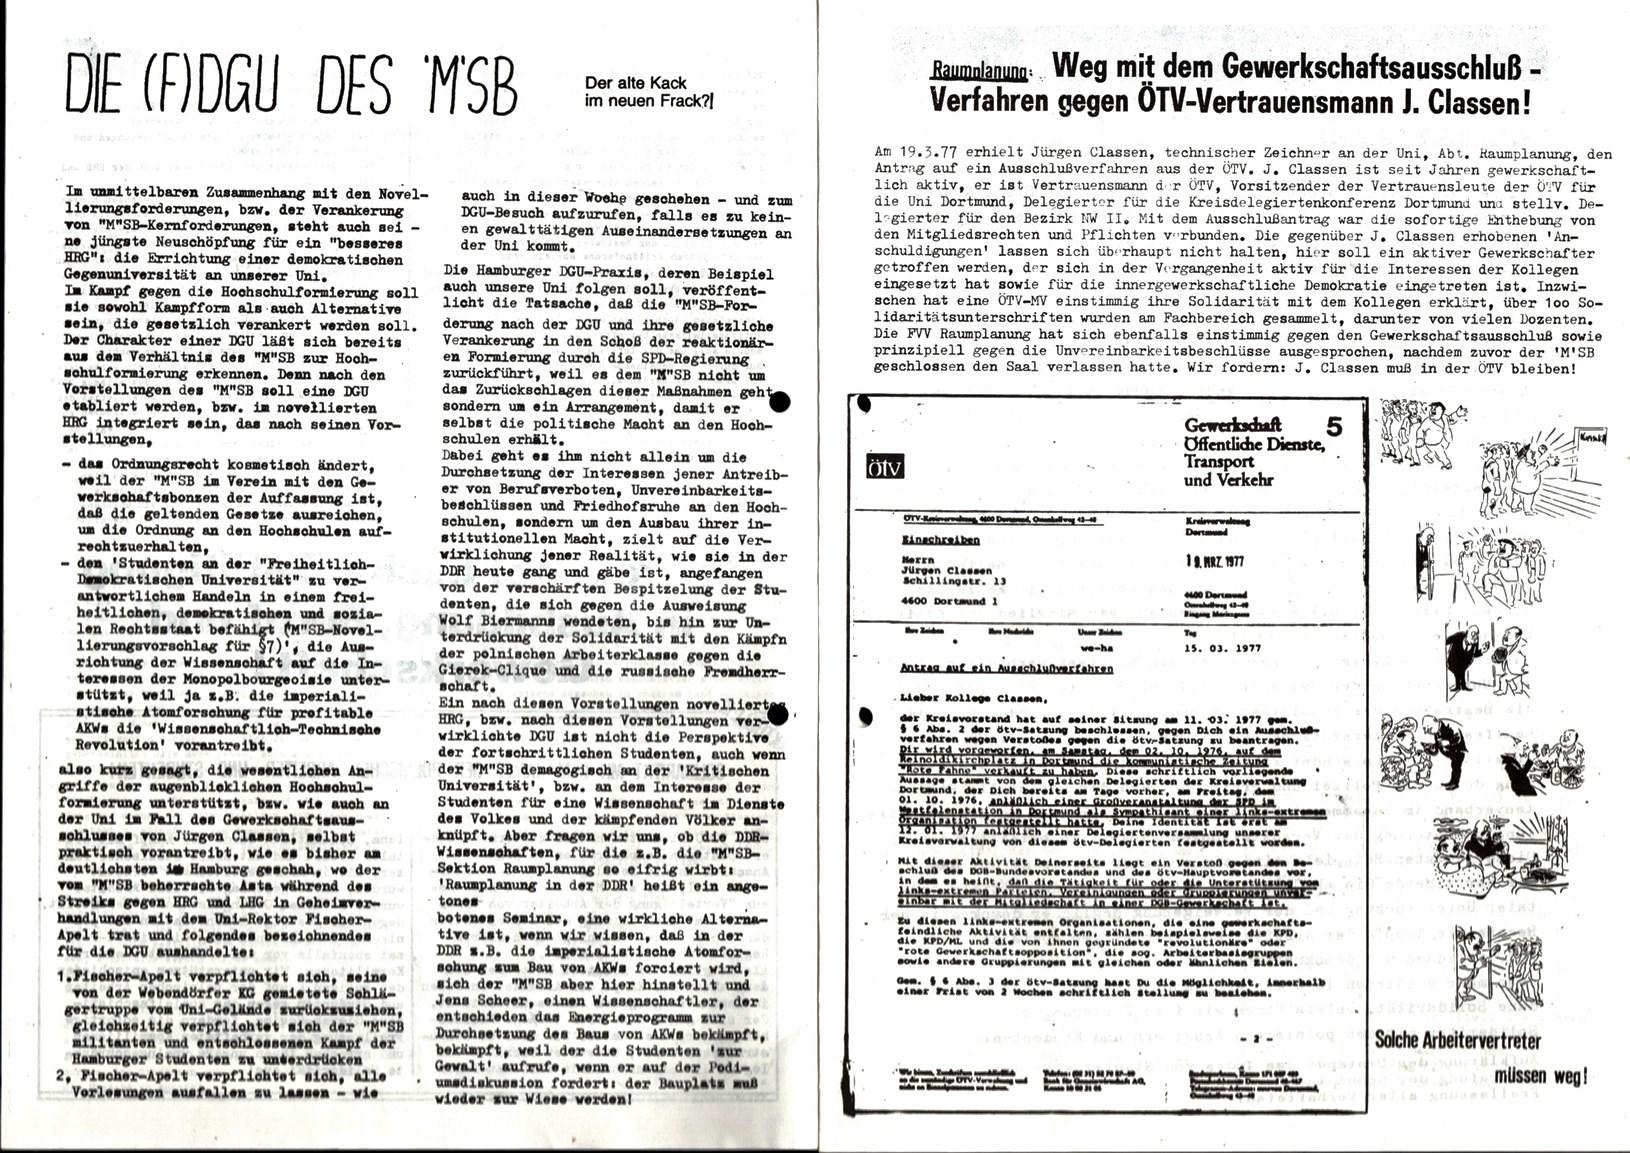 Dortmund_KSV_Studentenpresse_Uni_1977_05_17_003